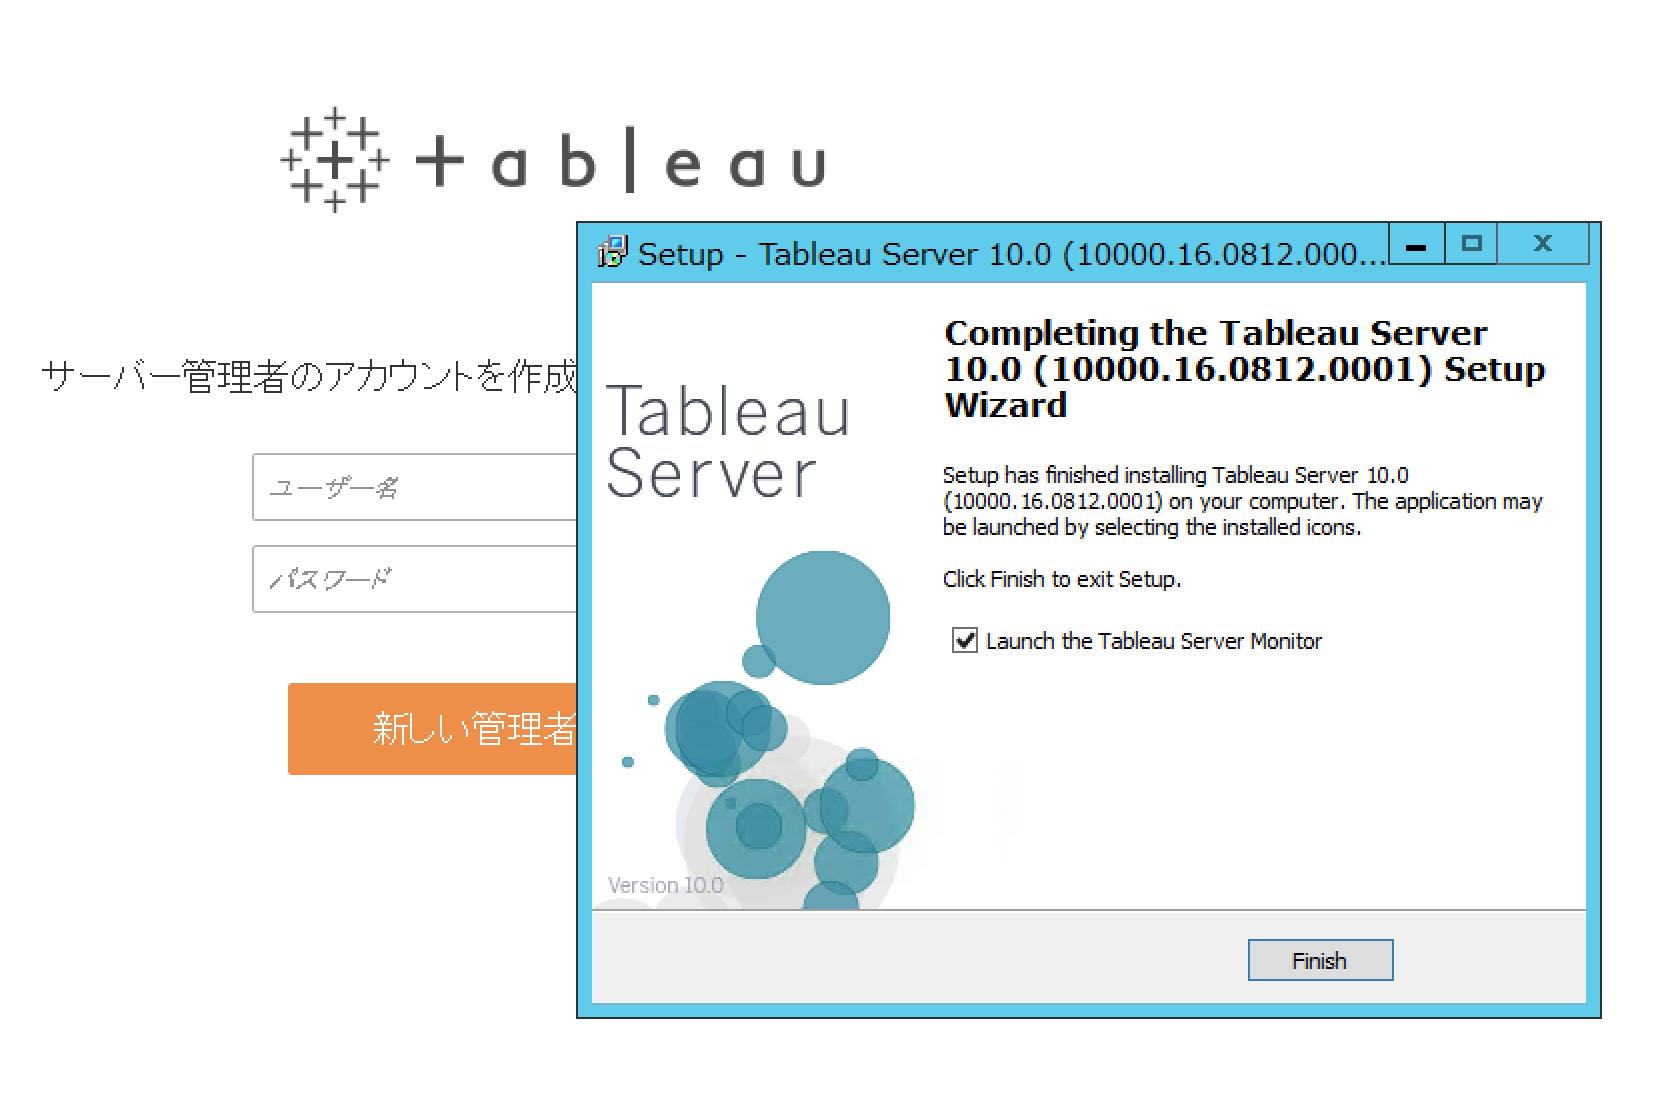 tabsv10-ad_11